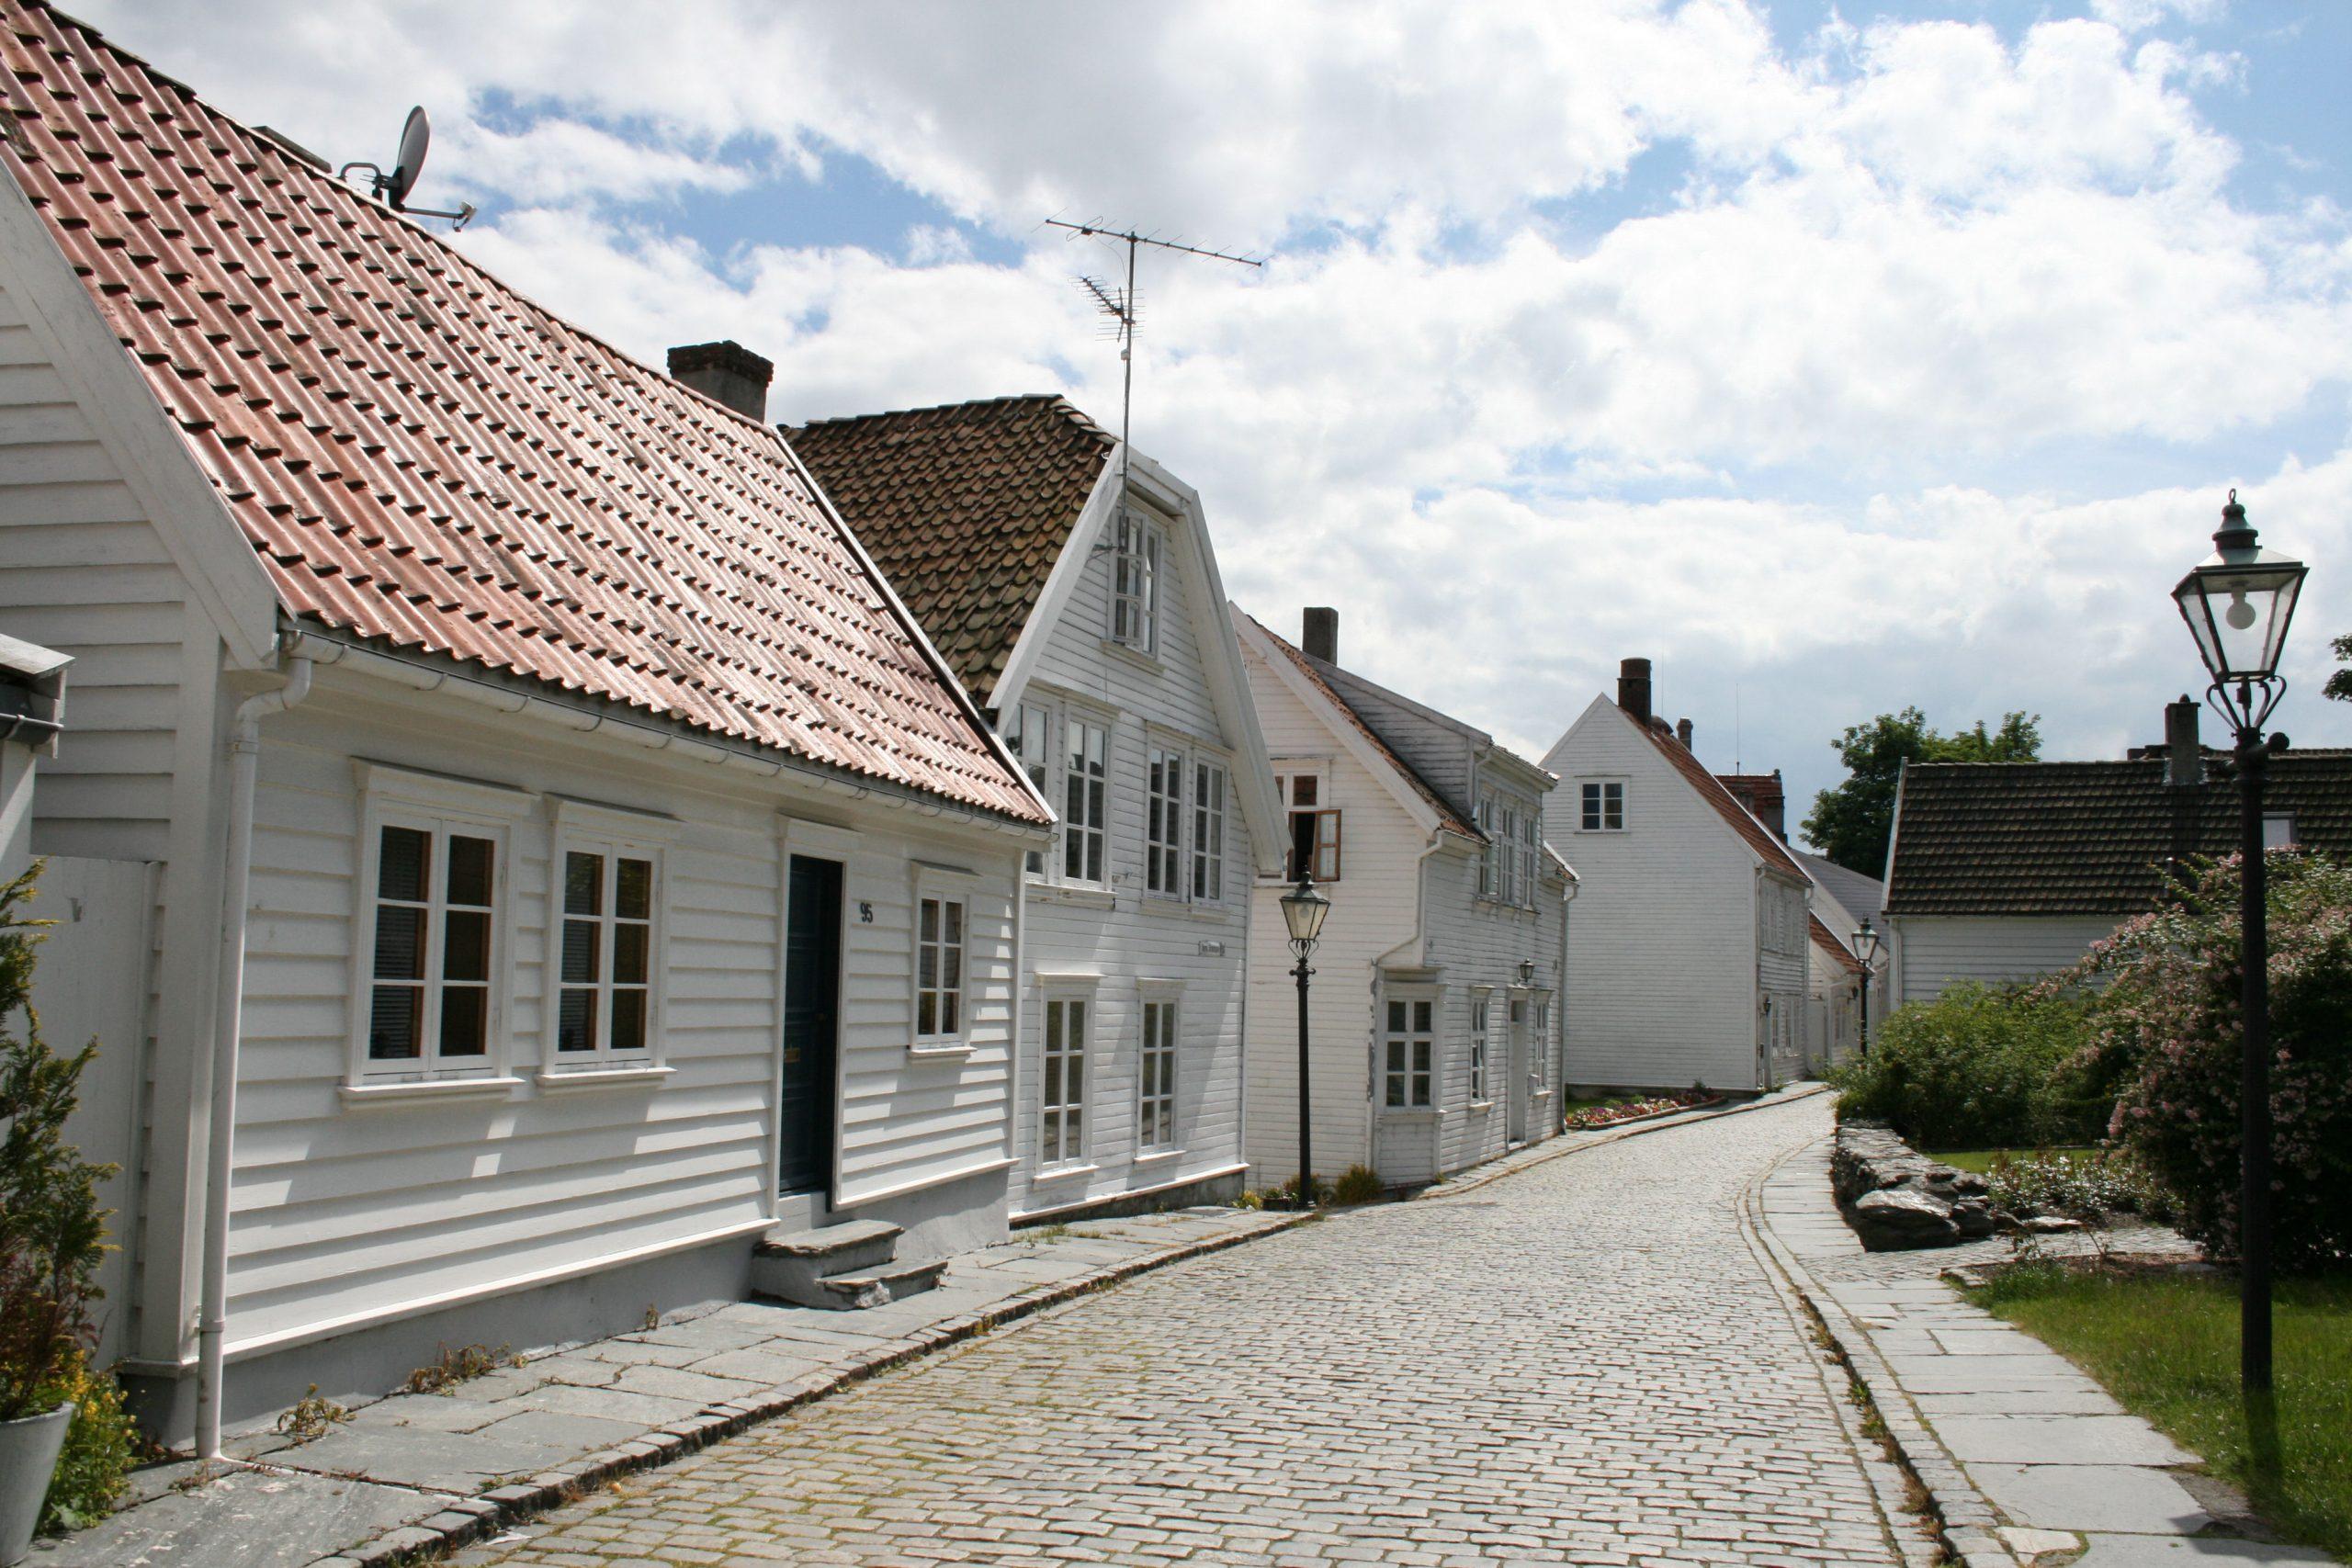 Gamle Stavanger (Old Town) - Place To Visit In Stavanger Region, Norway